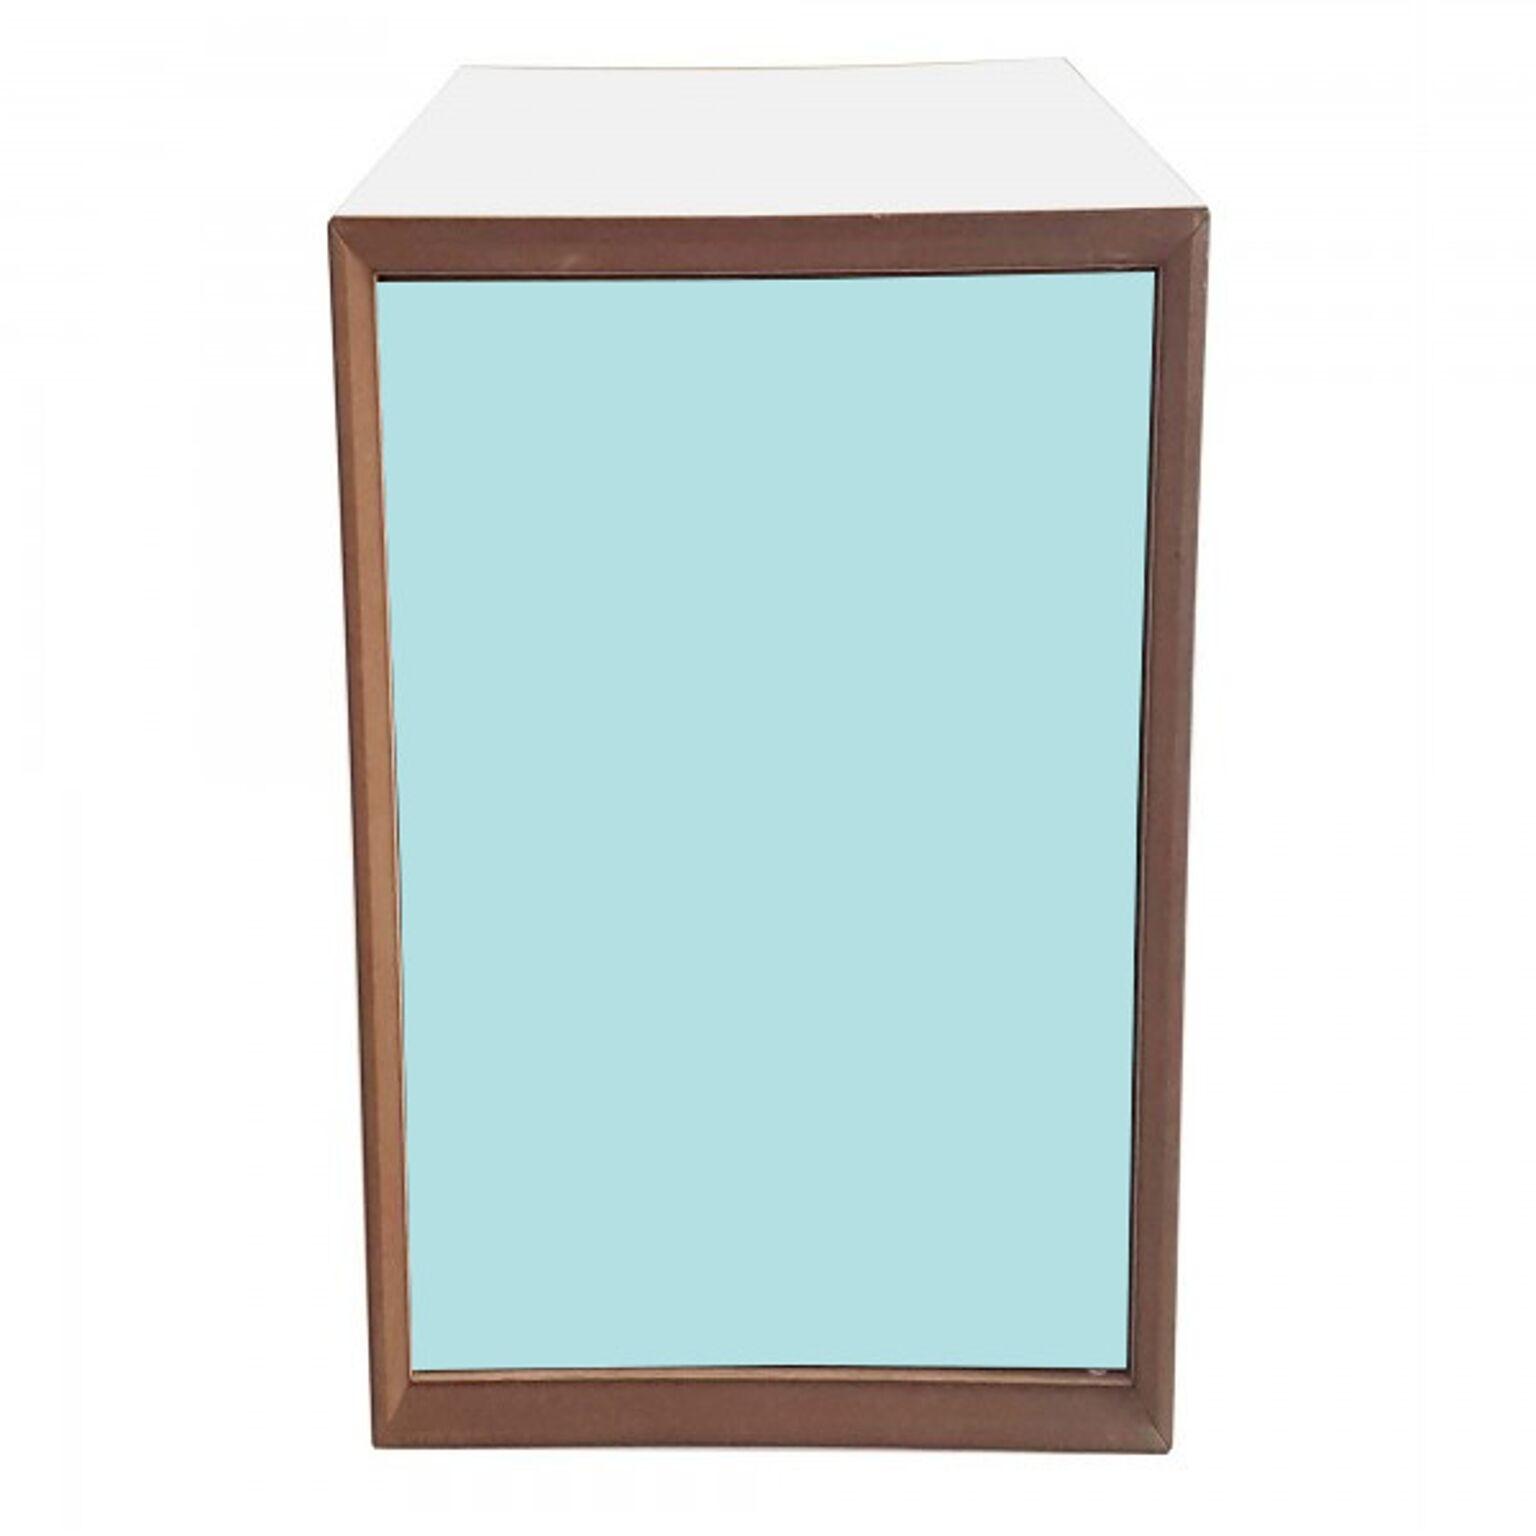 Dulap modular Pixel Light Turquoise / White, l40xA40xH80 cm